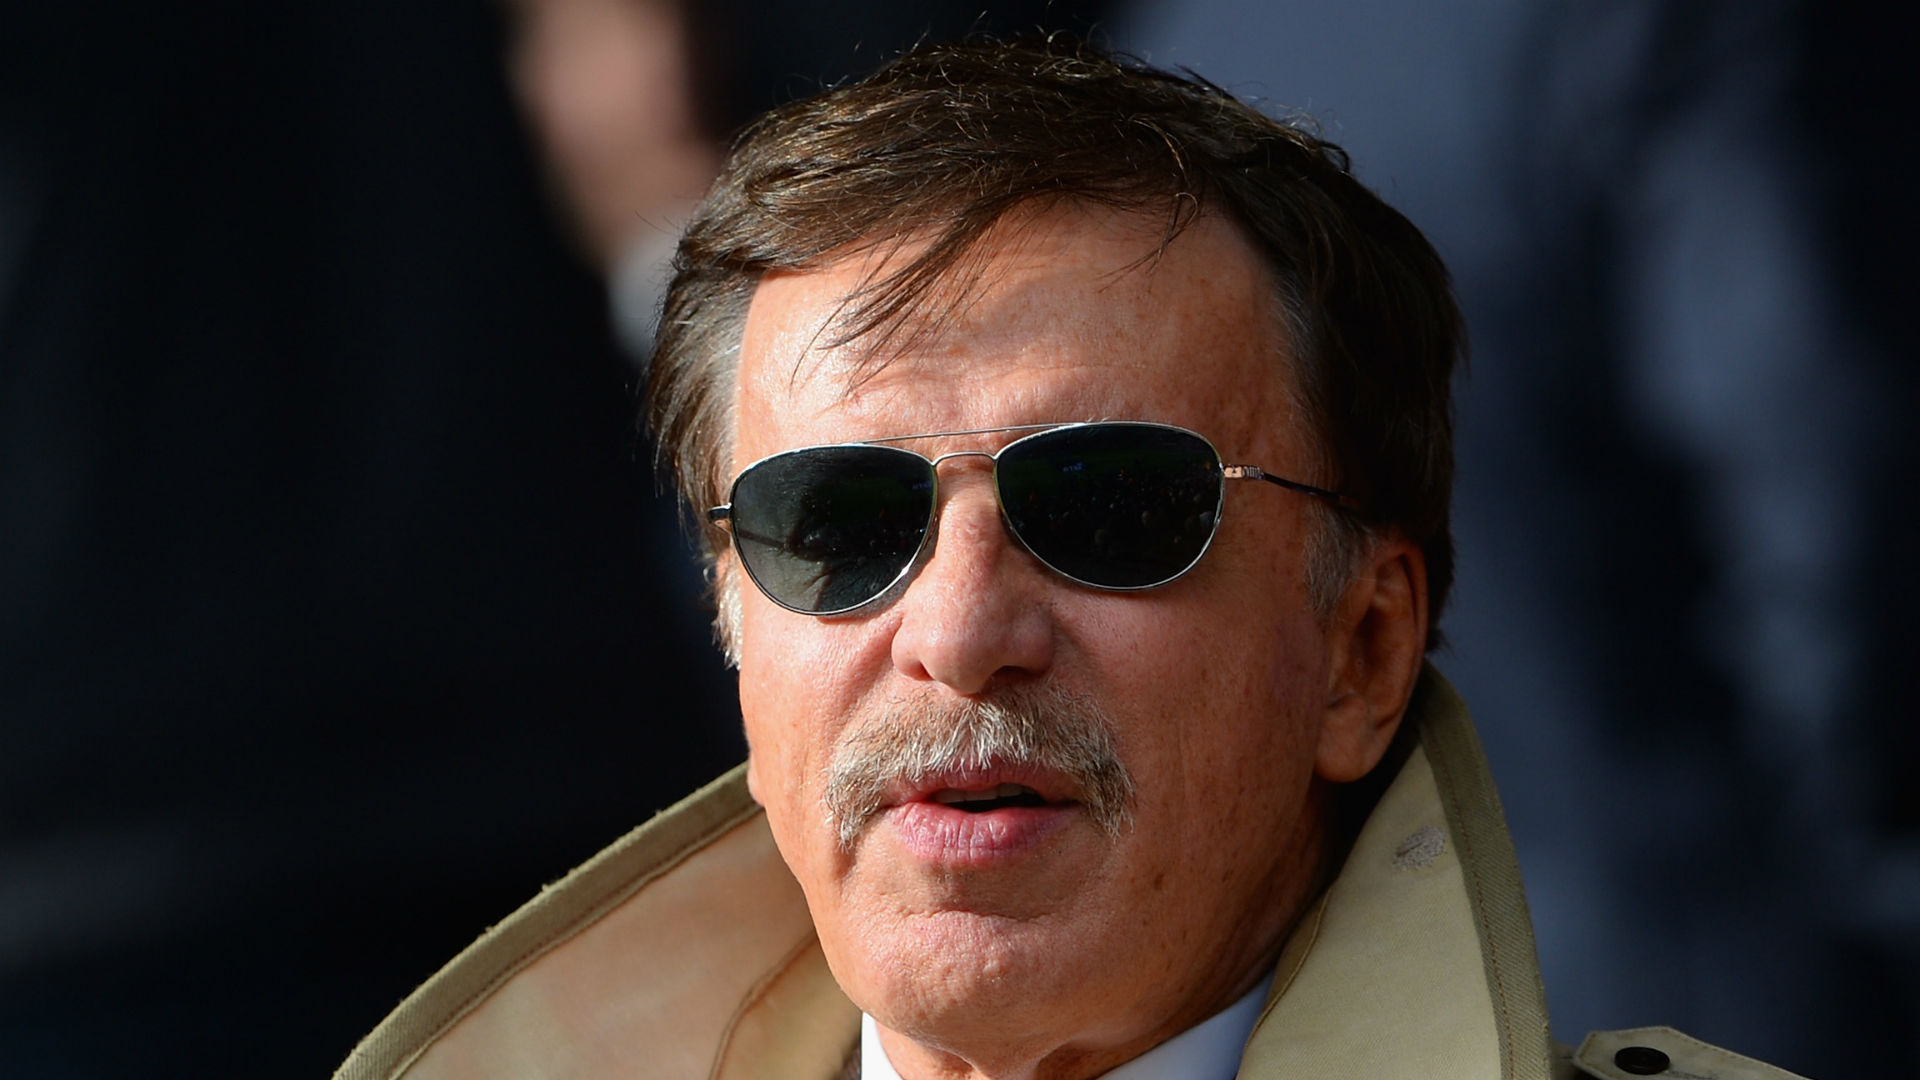 Arsenal fans demand changes from Kroenke